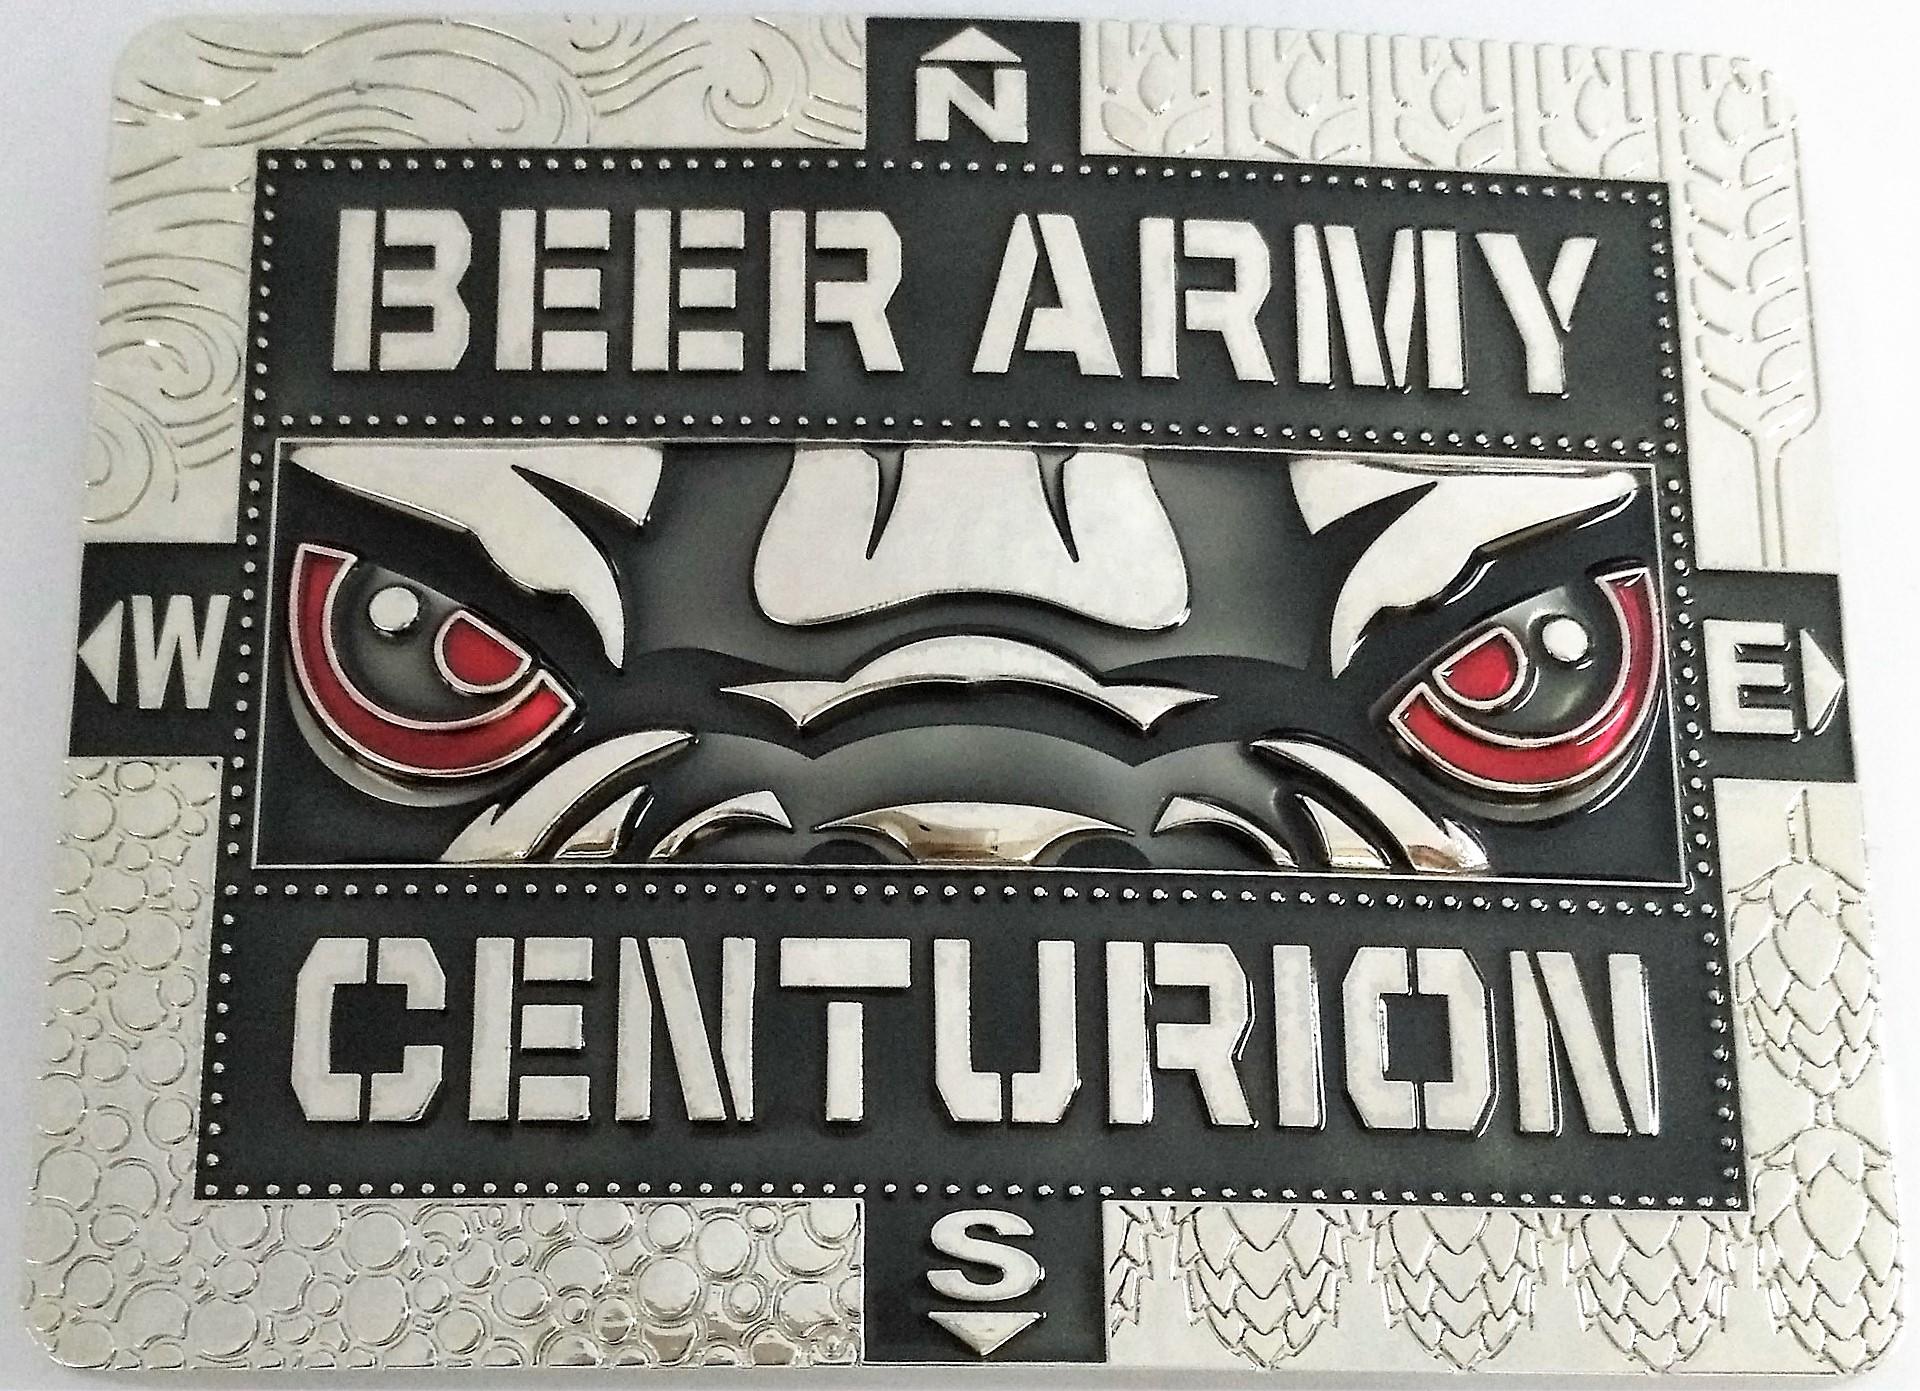 The current Centurion Challenge belt buckle